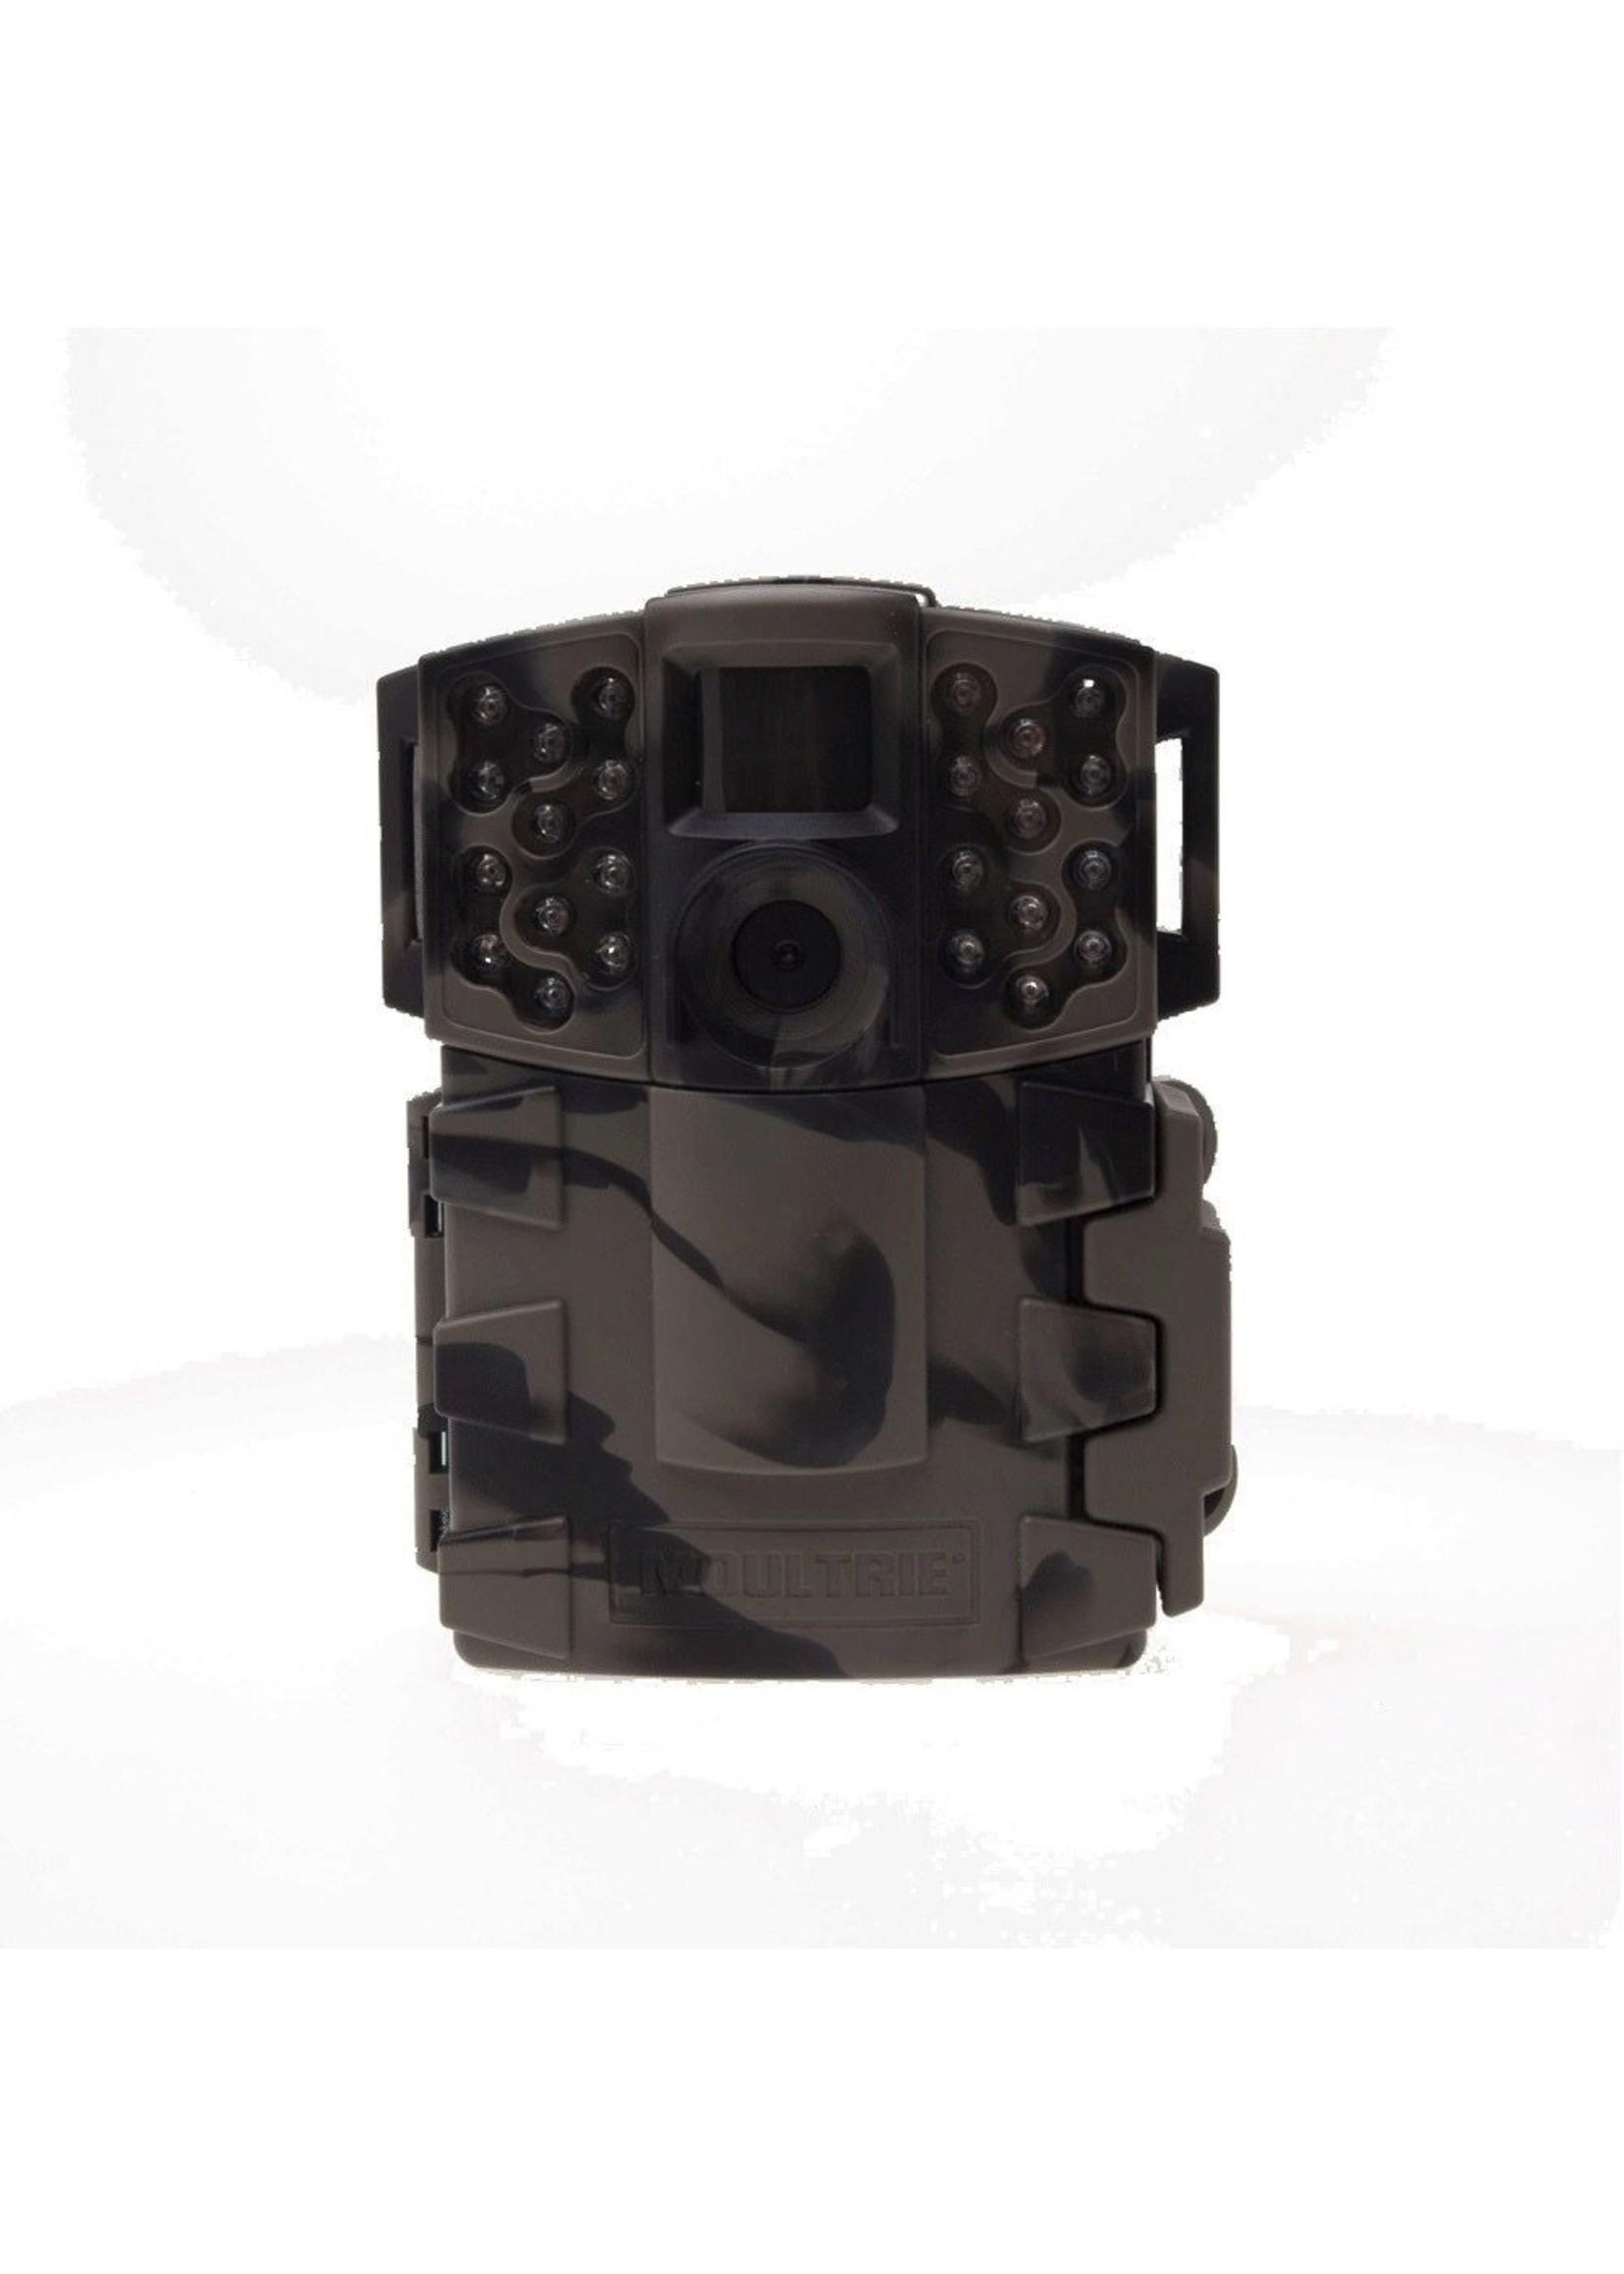 Moultrie Moultrie M-880 Gen2 Trail Camera